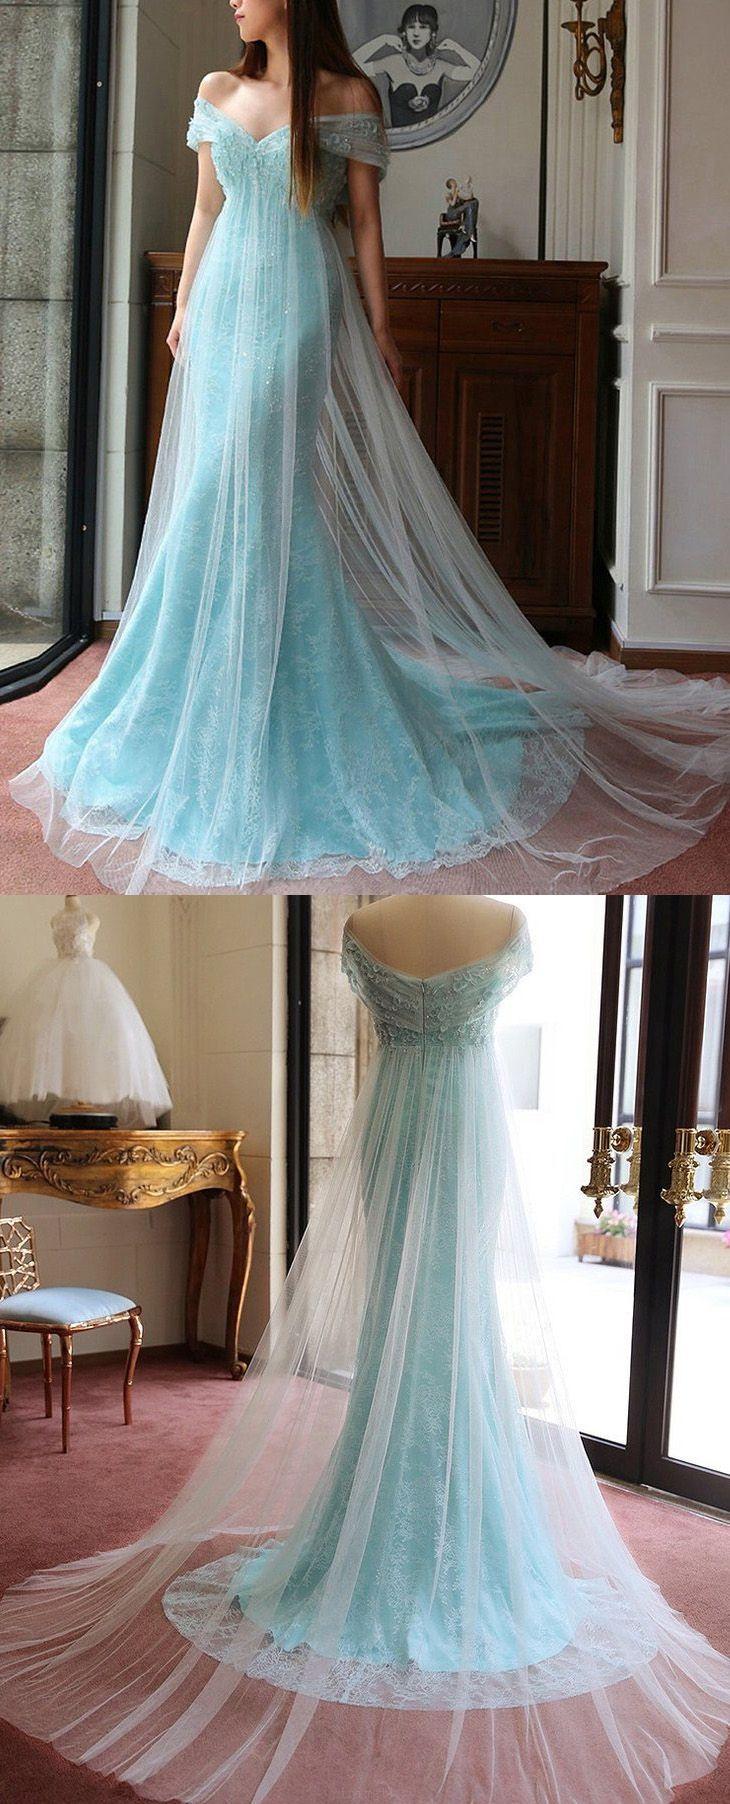 Customized feminine light blue long evening prom dress with zipper